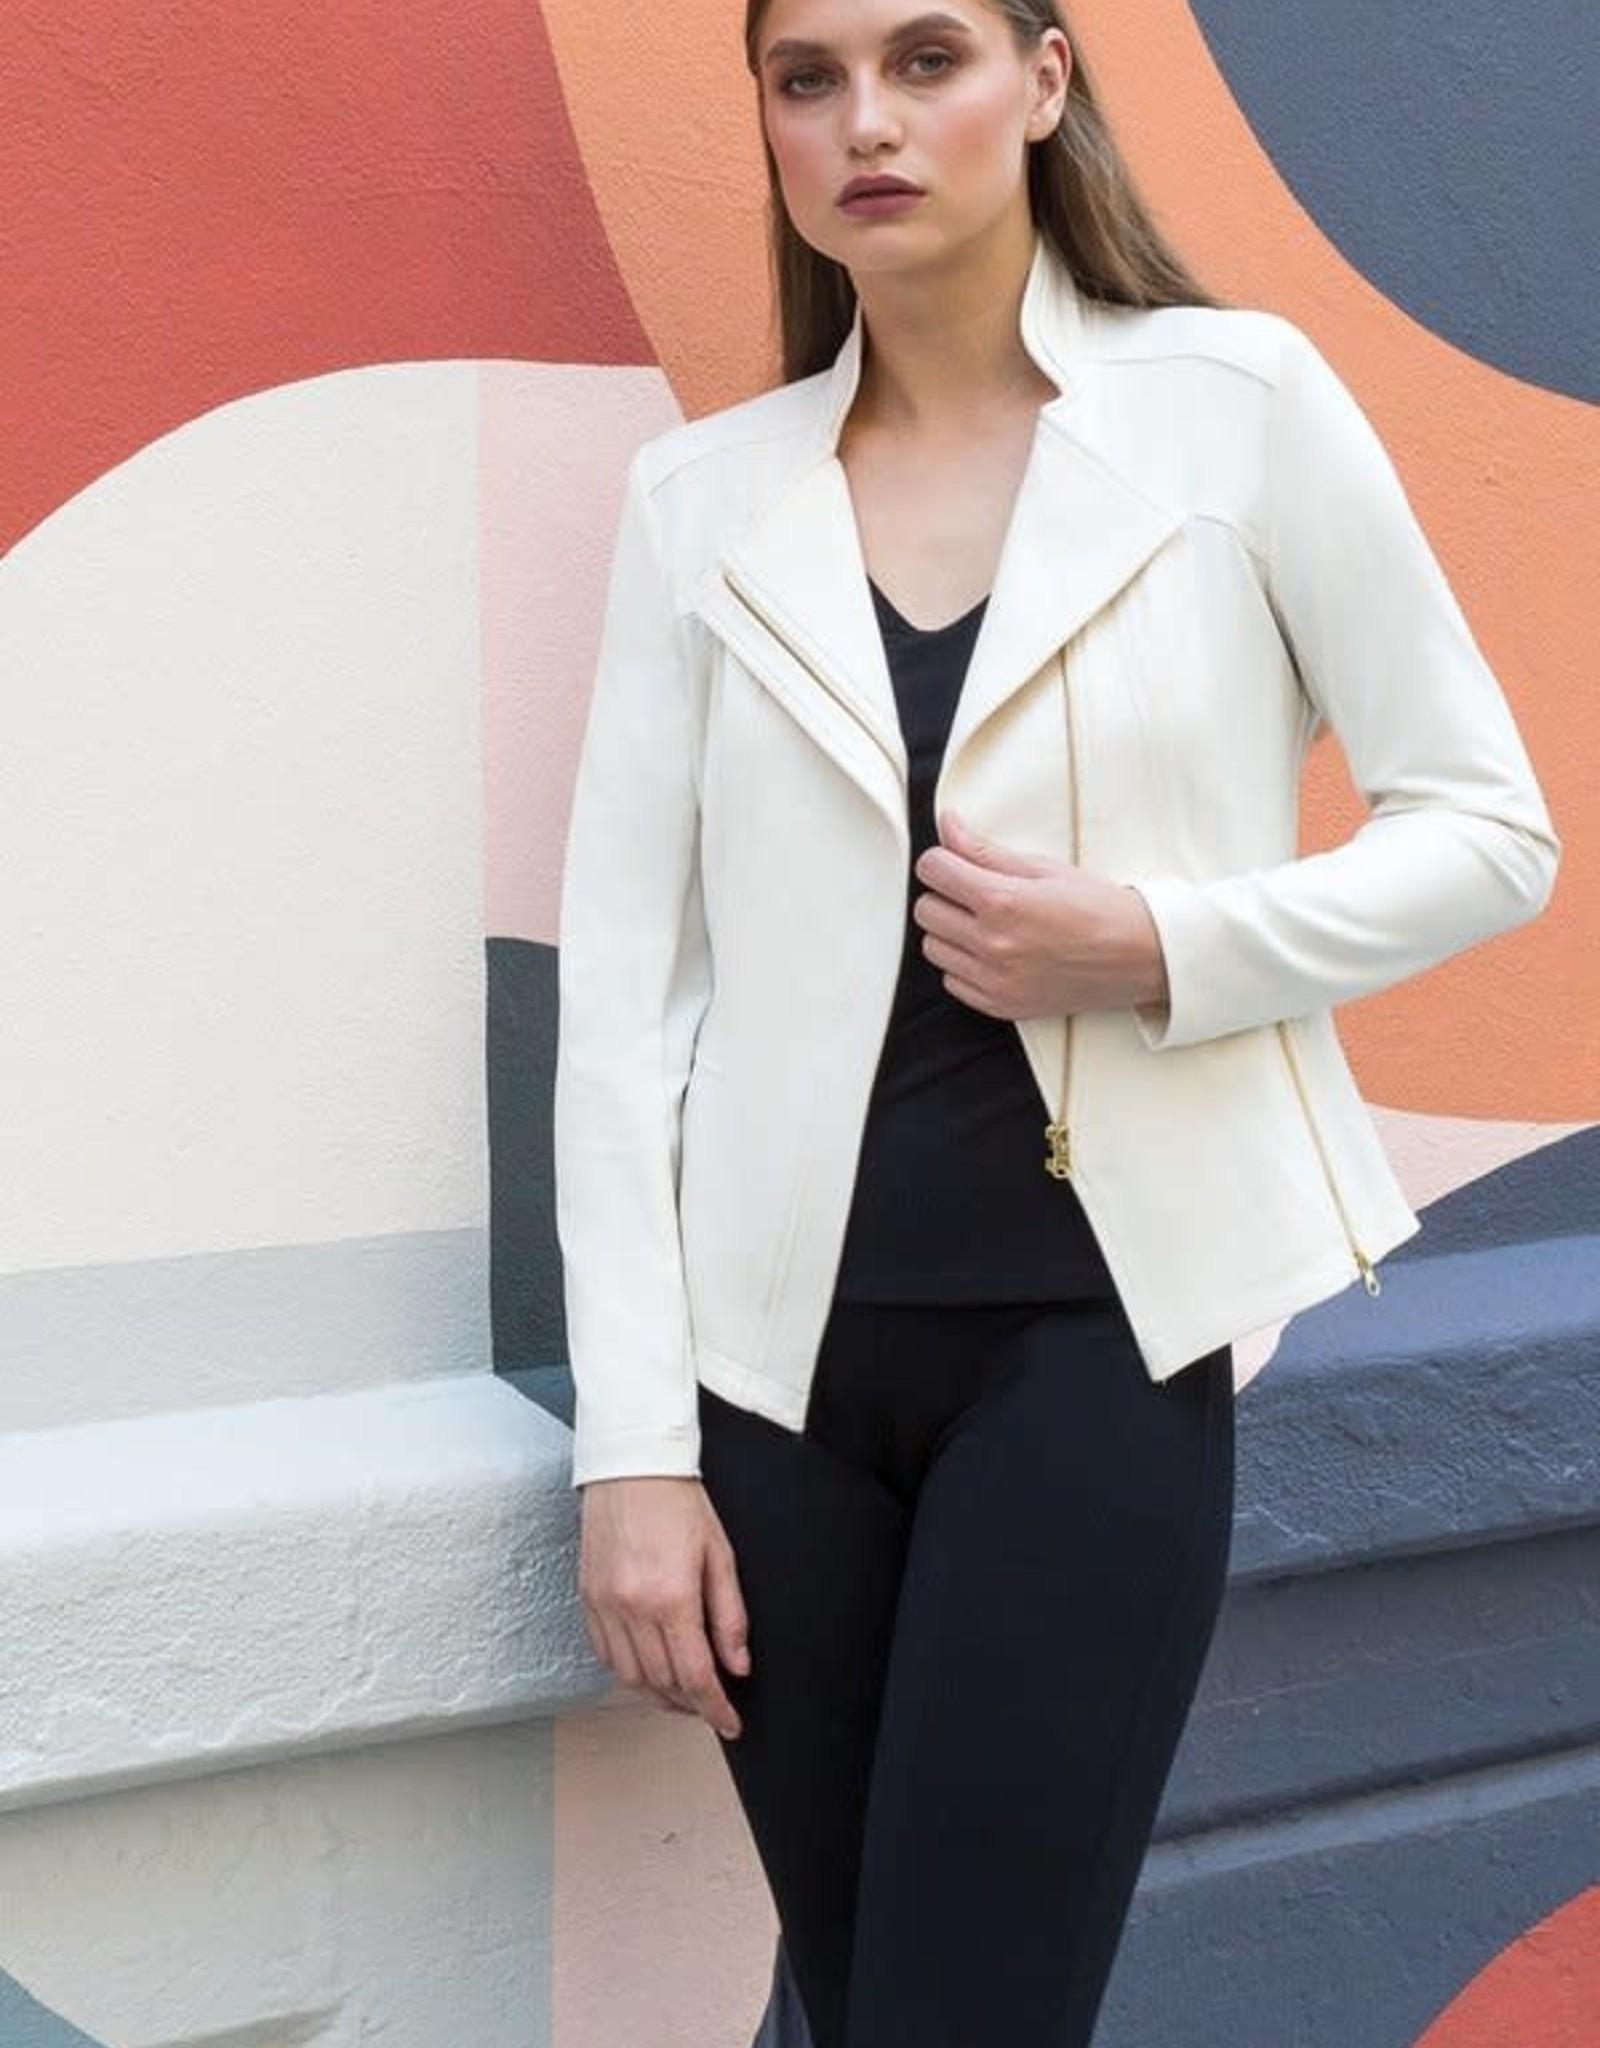 - Ivory Liquid Leather Jacket